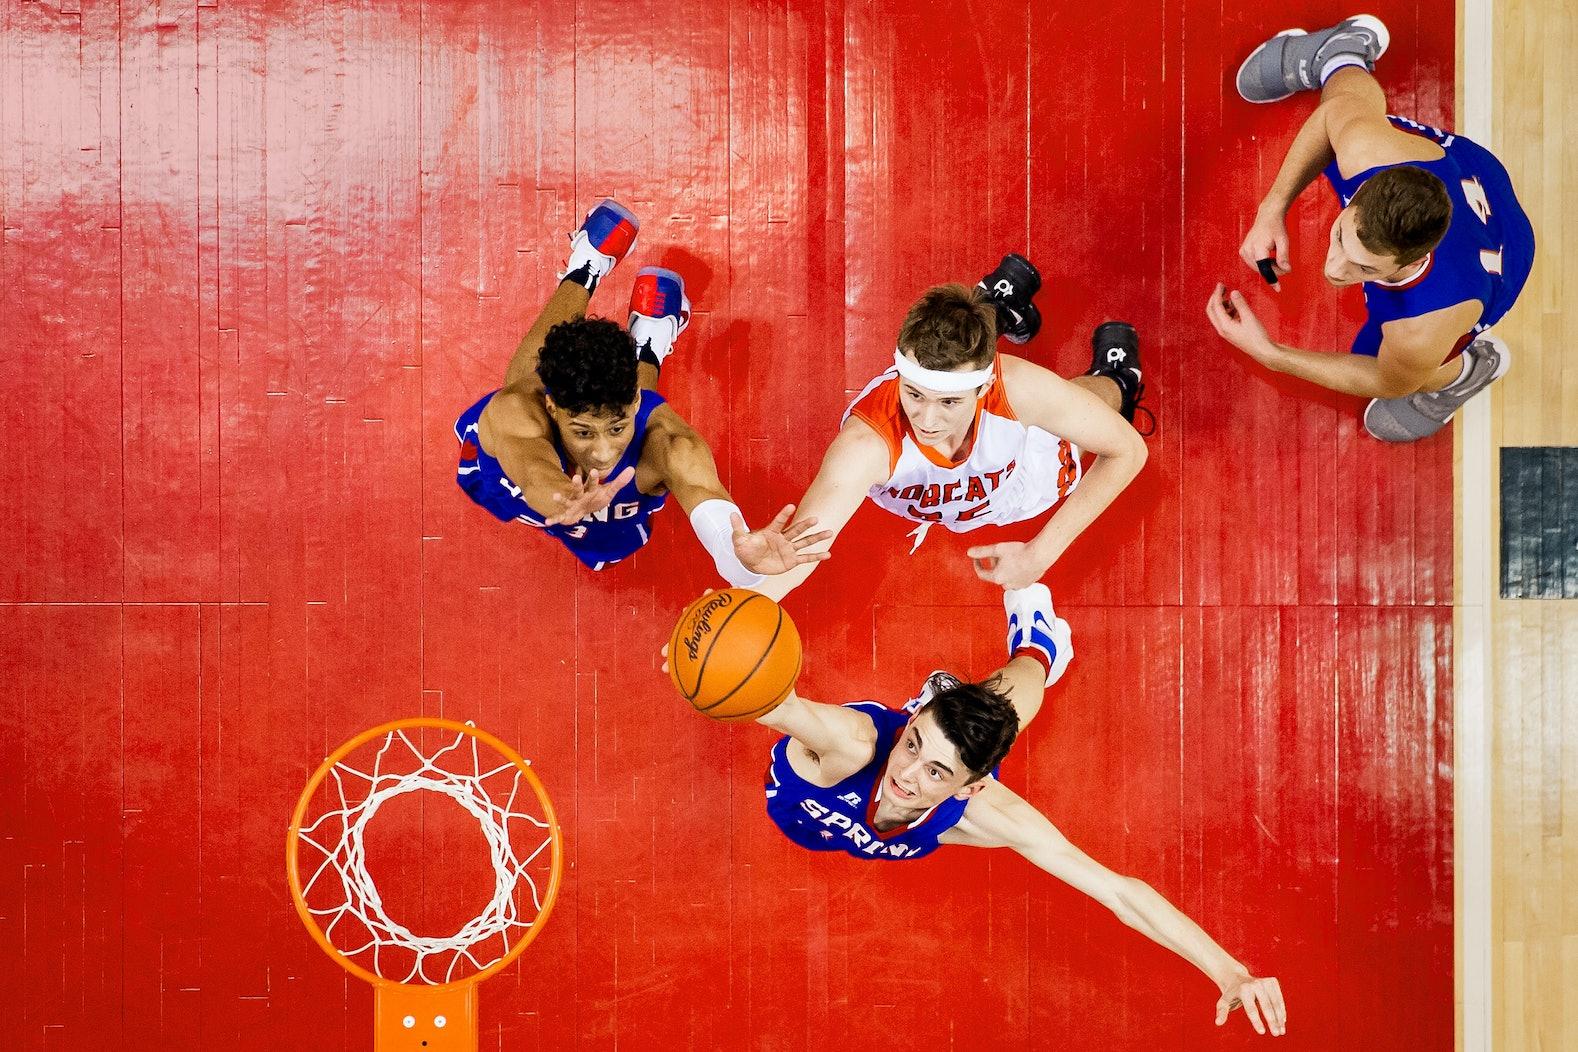 sport : jeff lautenberger photo + video : houston, texas